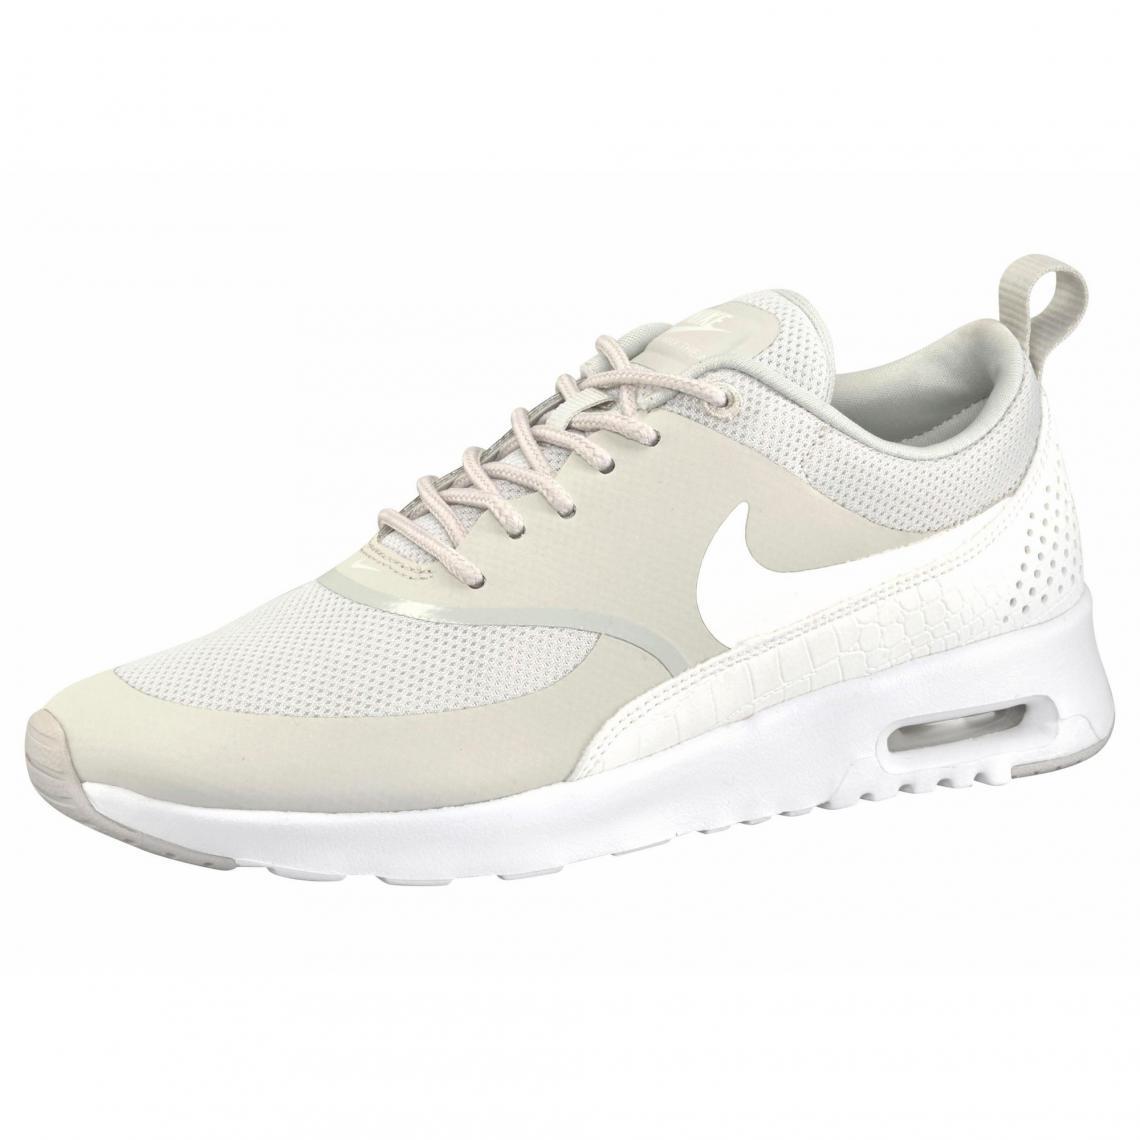 Air Chaussures Max Nike Femme Noir3 De Thea Running Suisses 1lKFJTc